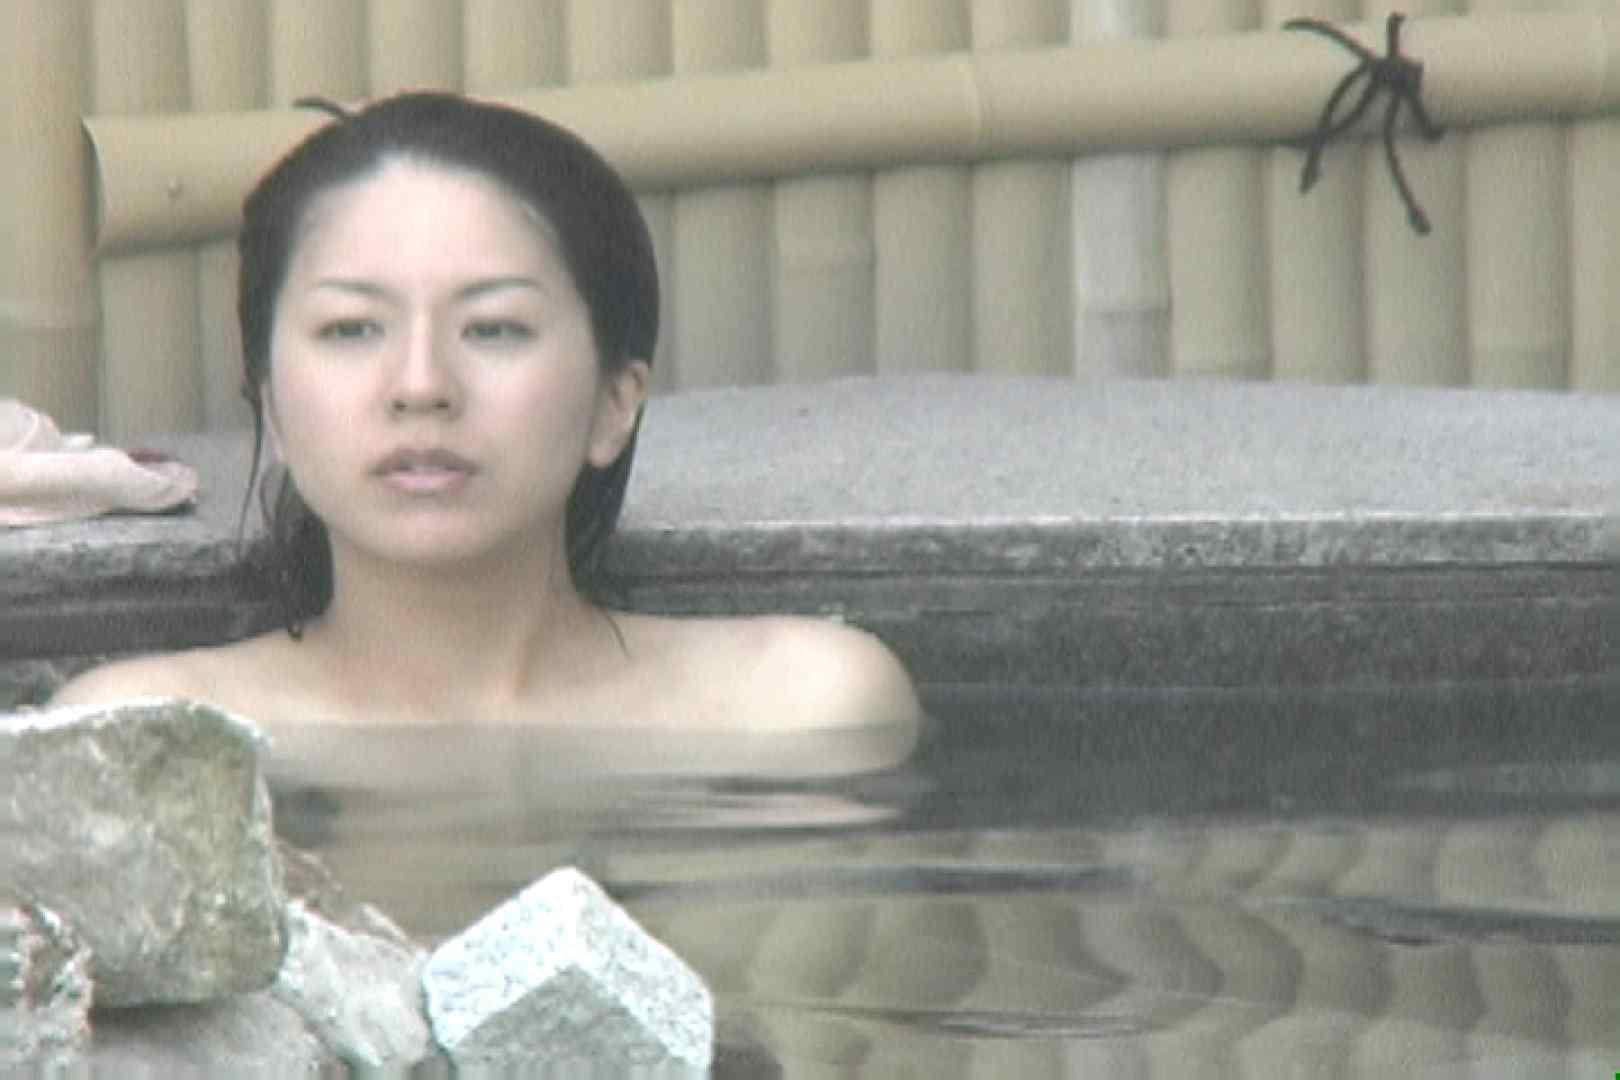 Aquaな露天風呂Vol.694 盗撮 AV無料 67画像 14